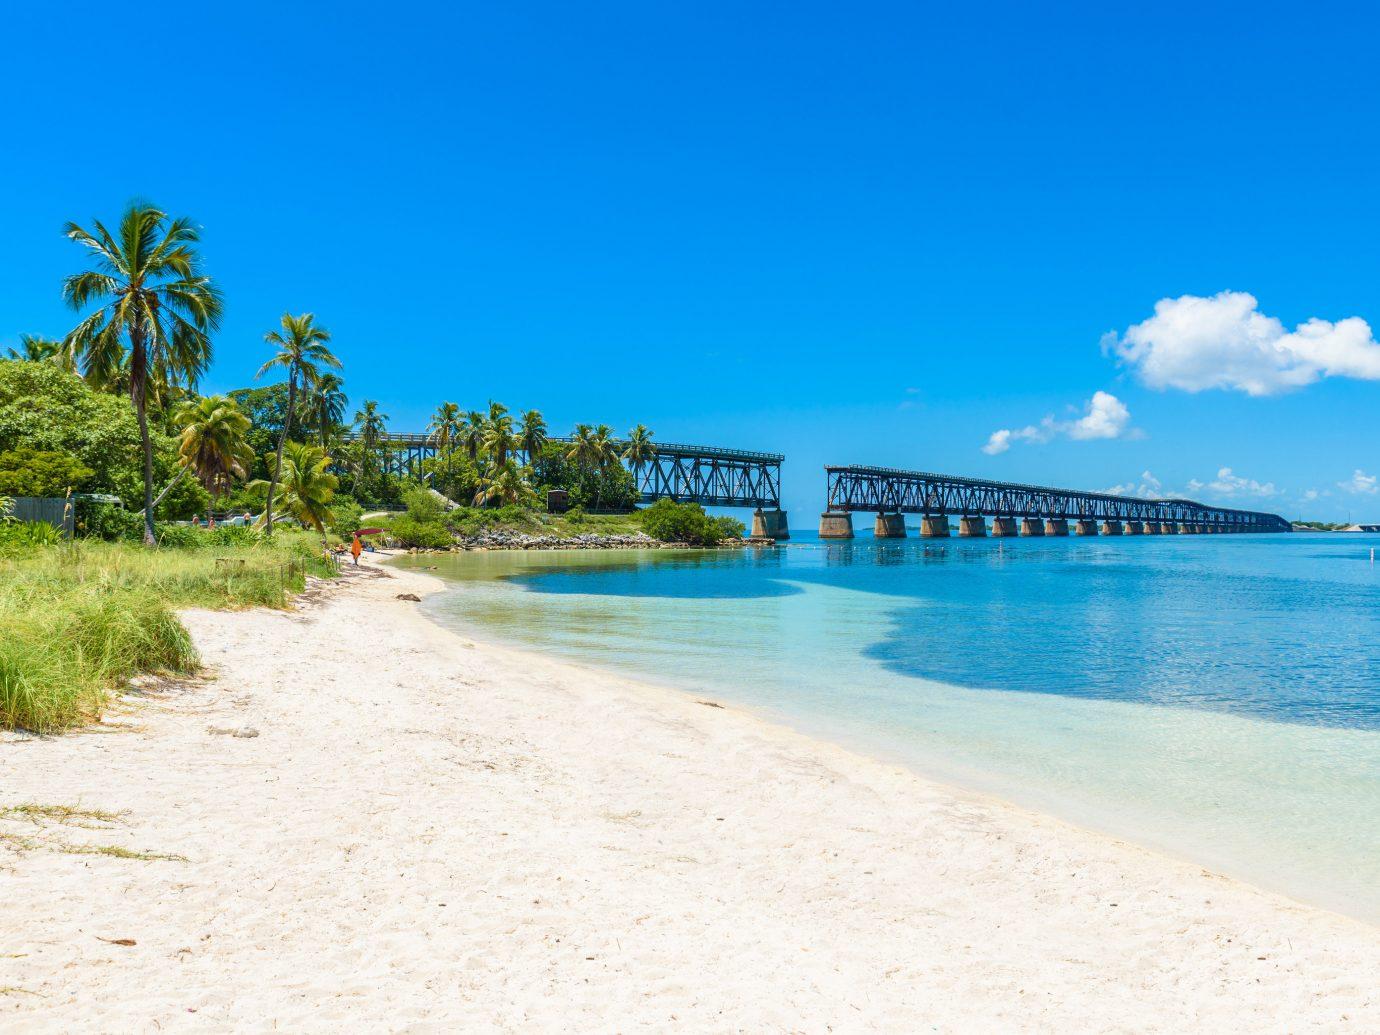 Calusa Beach in the Florida Keys